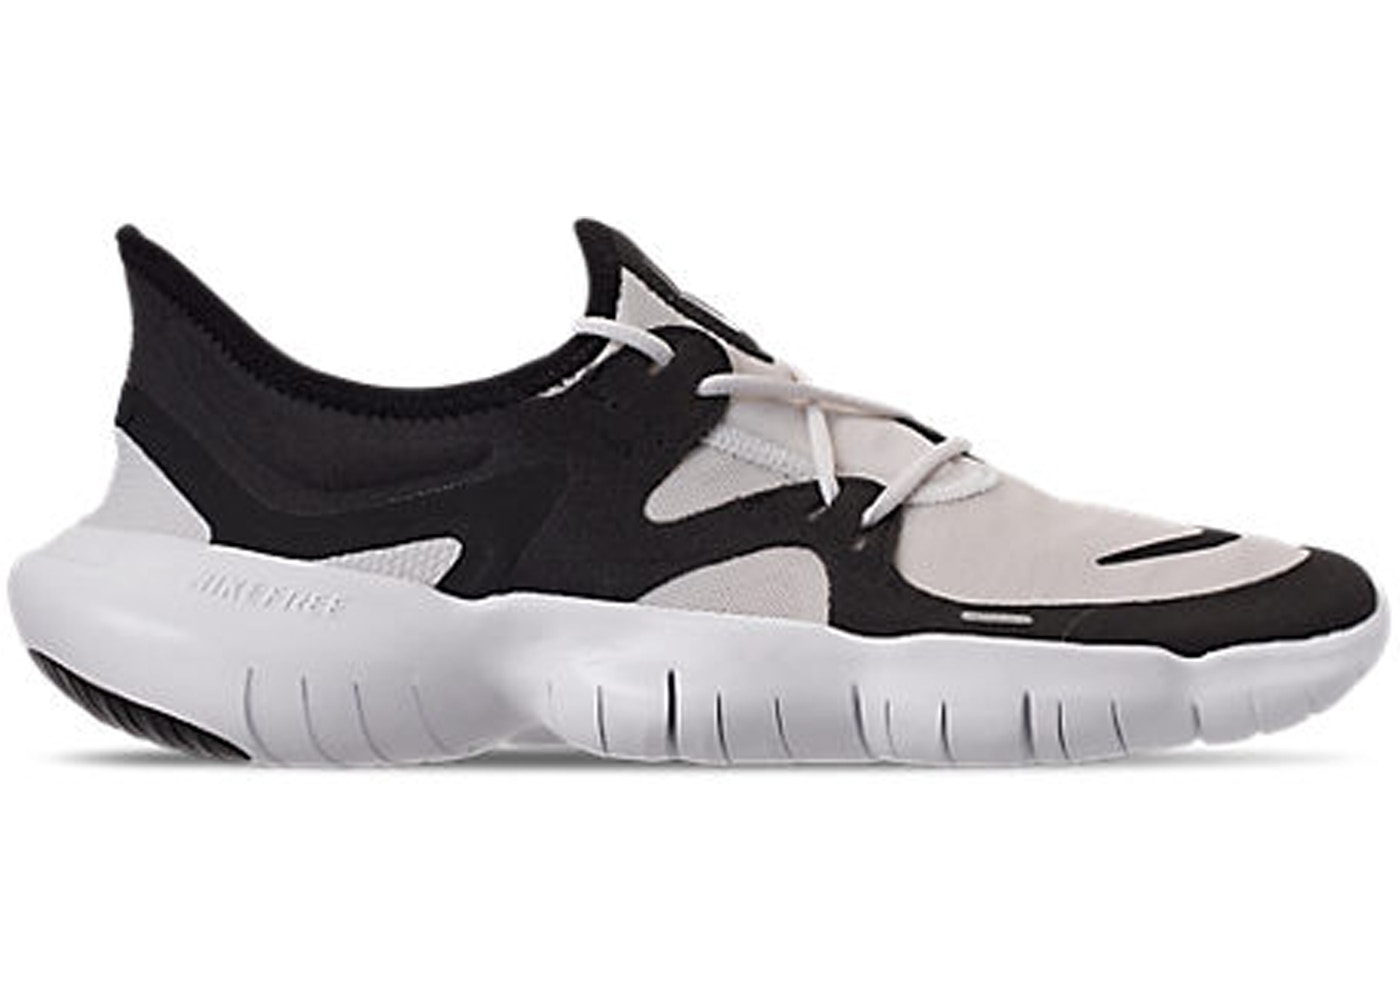 Nike Free RN 5.0 White Black